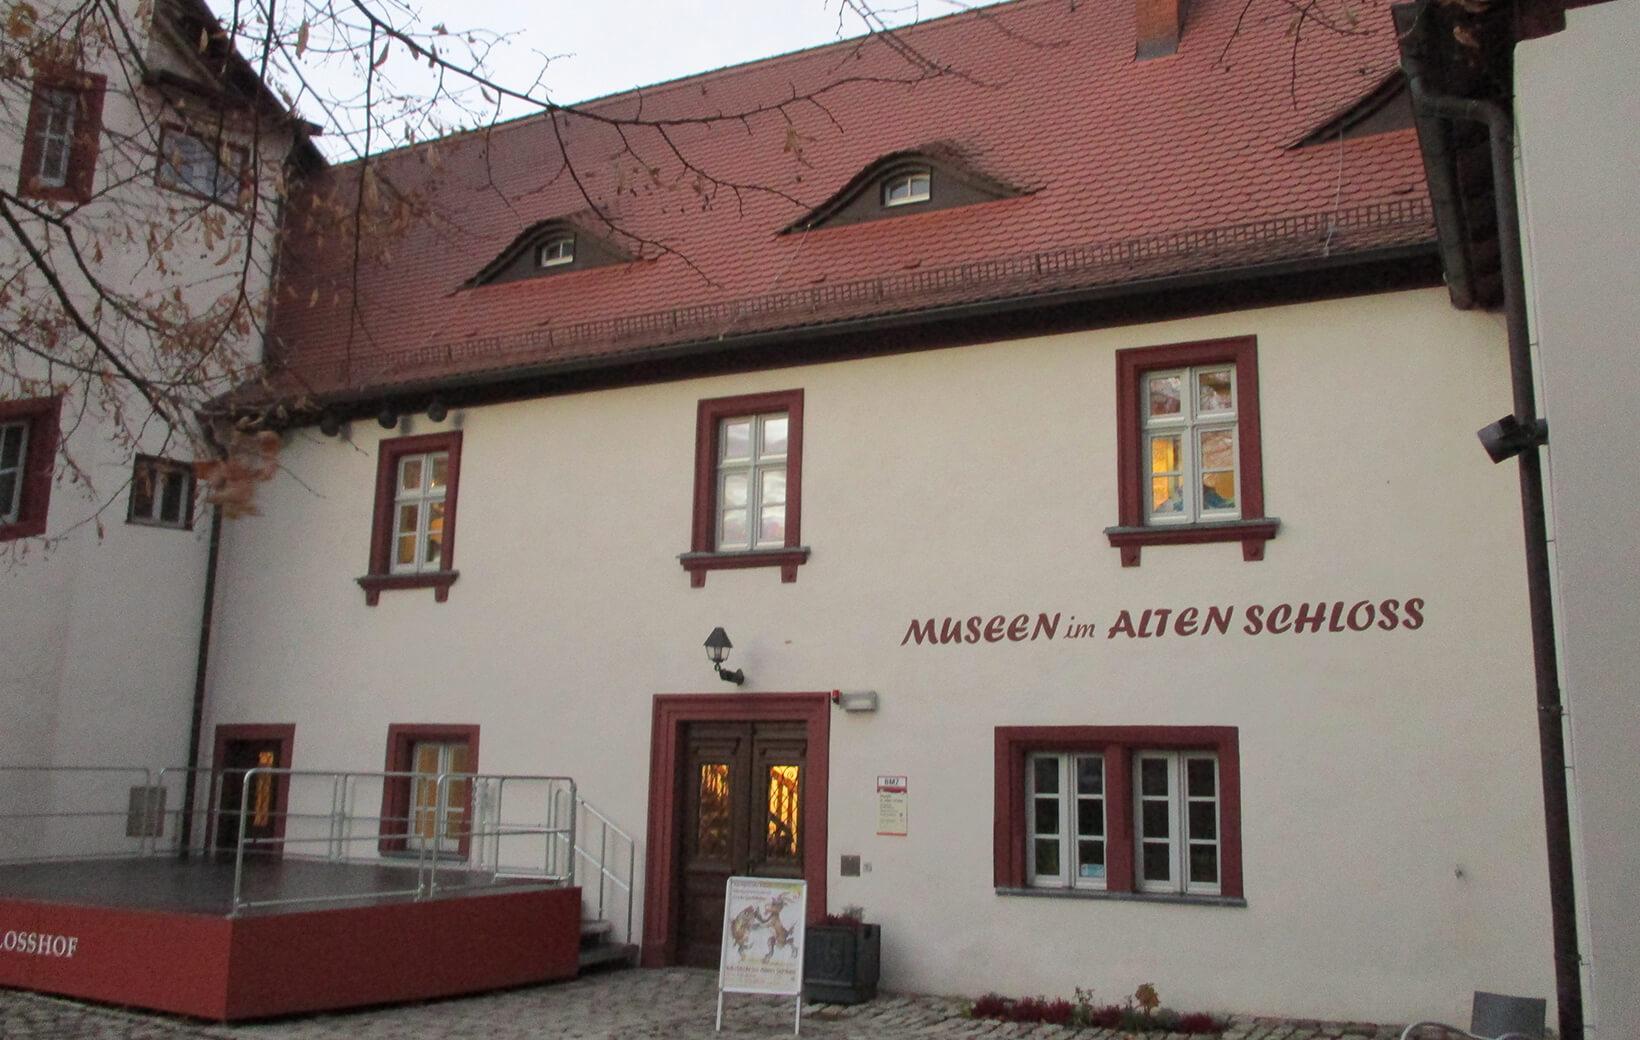 Schlosshof-Museum